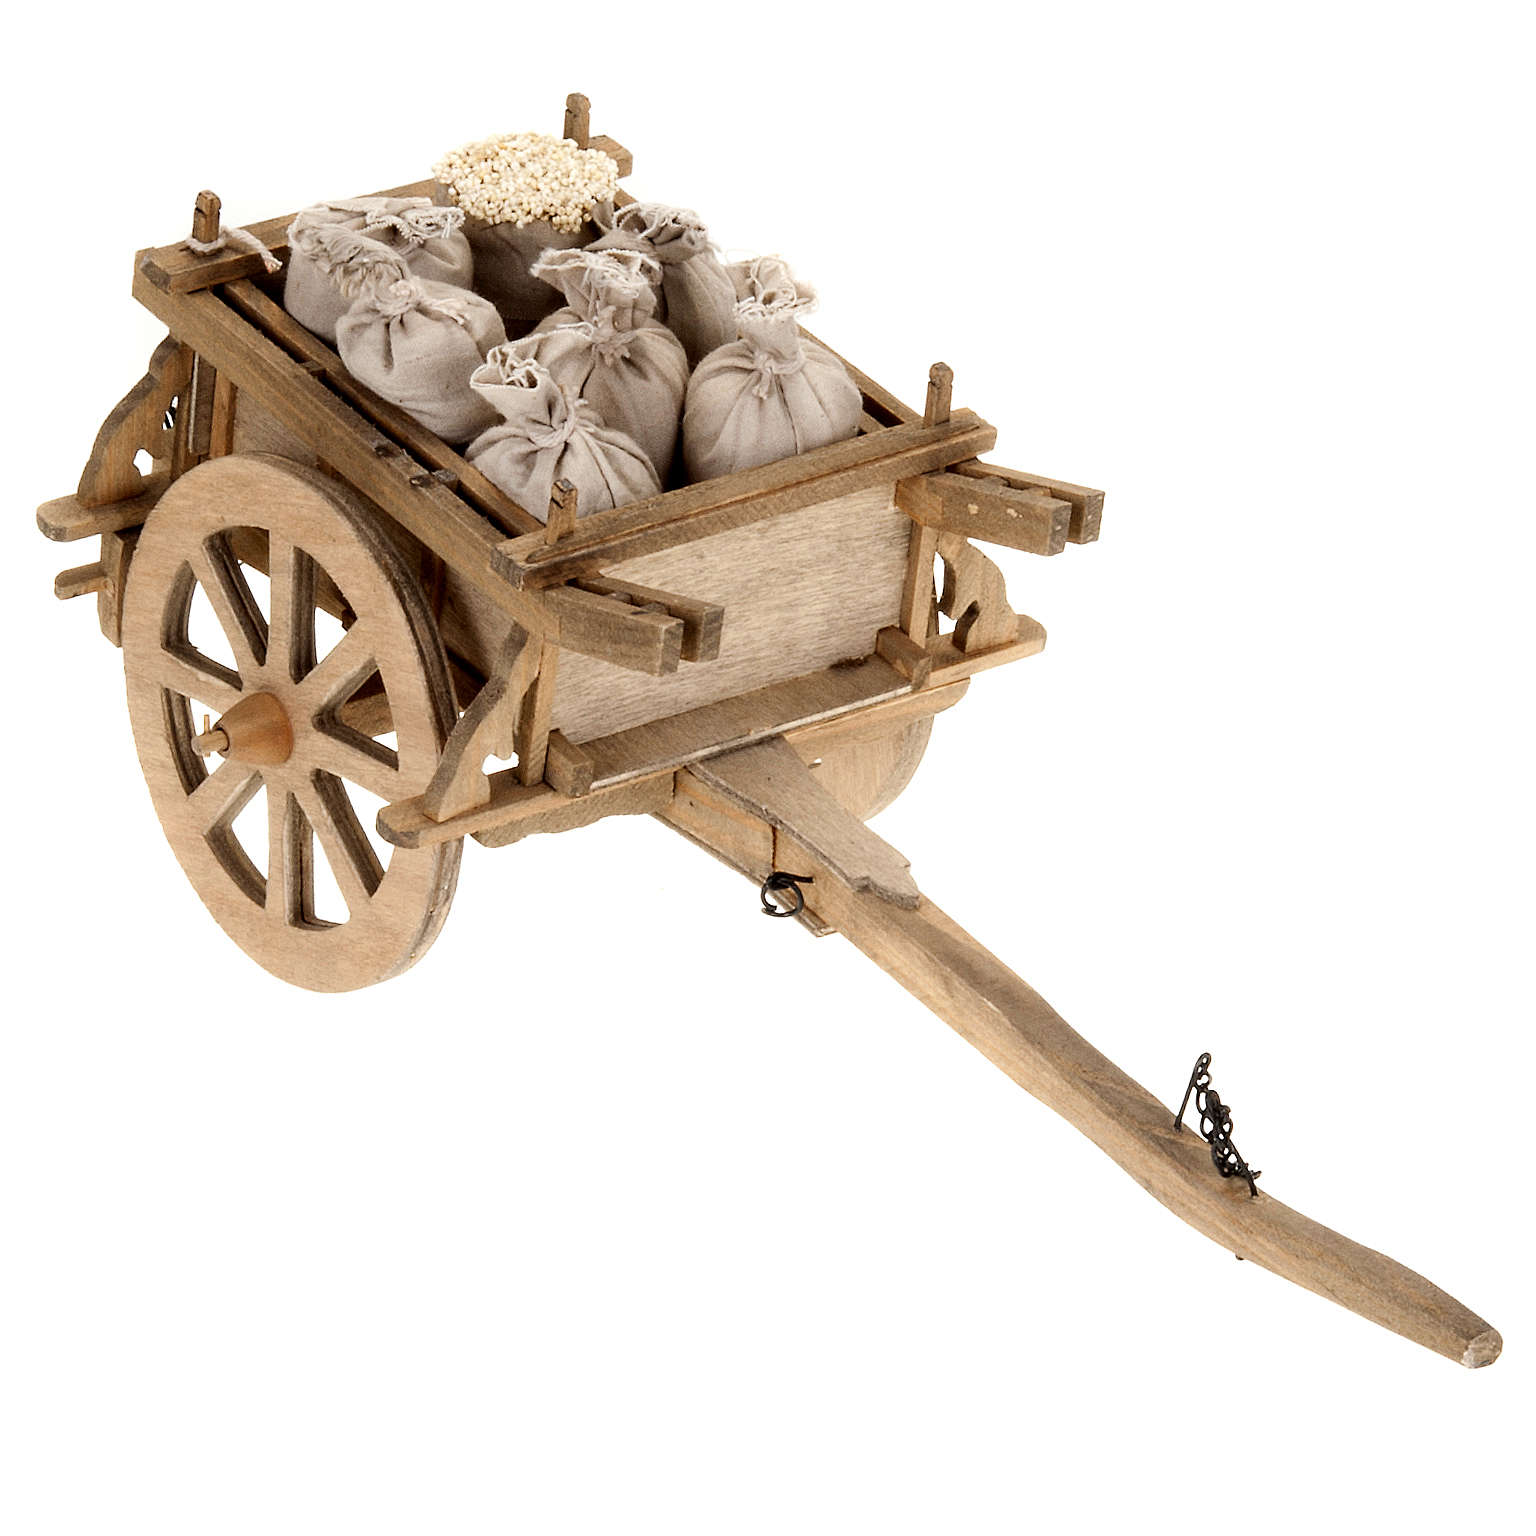 Charrette bois crèche 12x15 cm 4